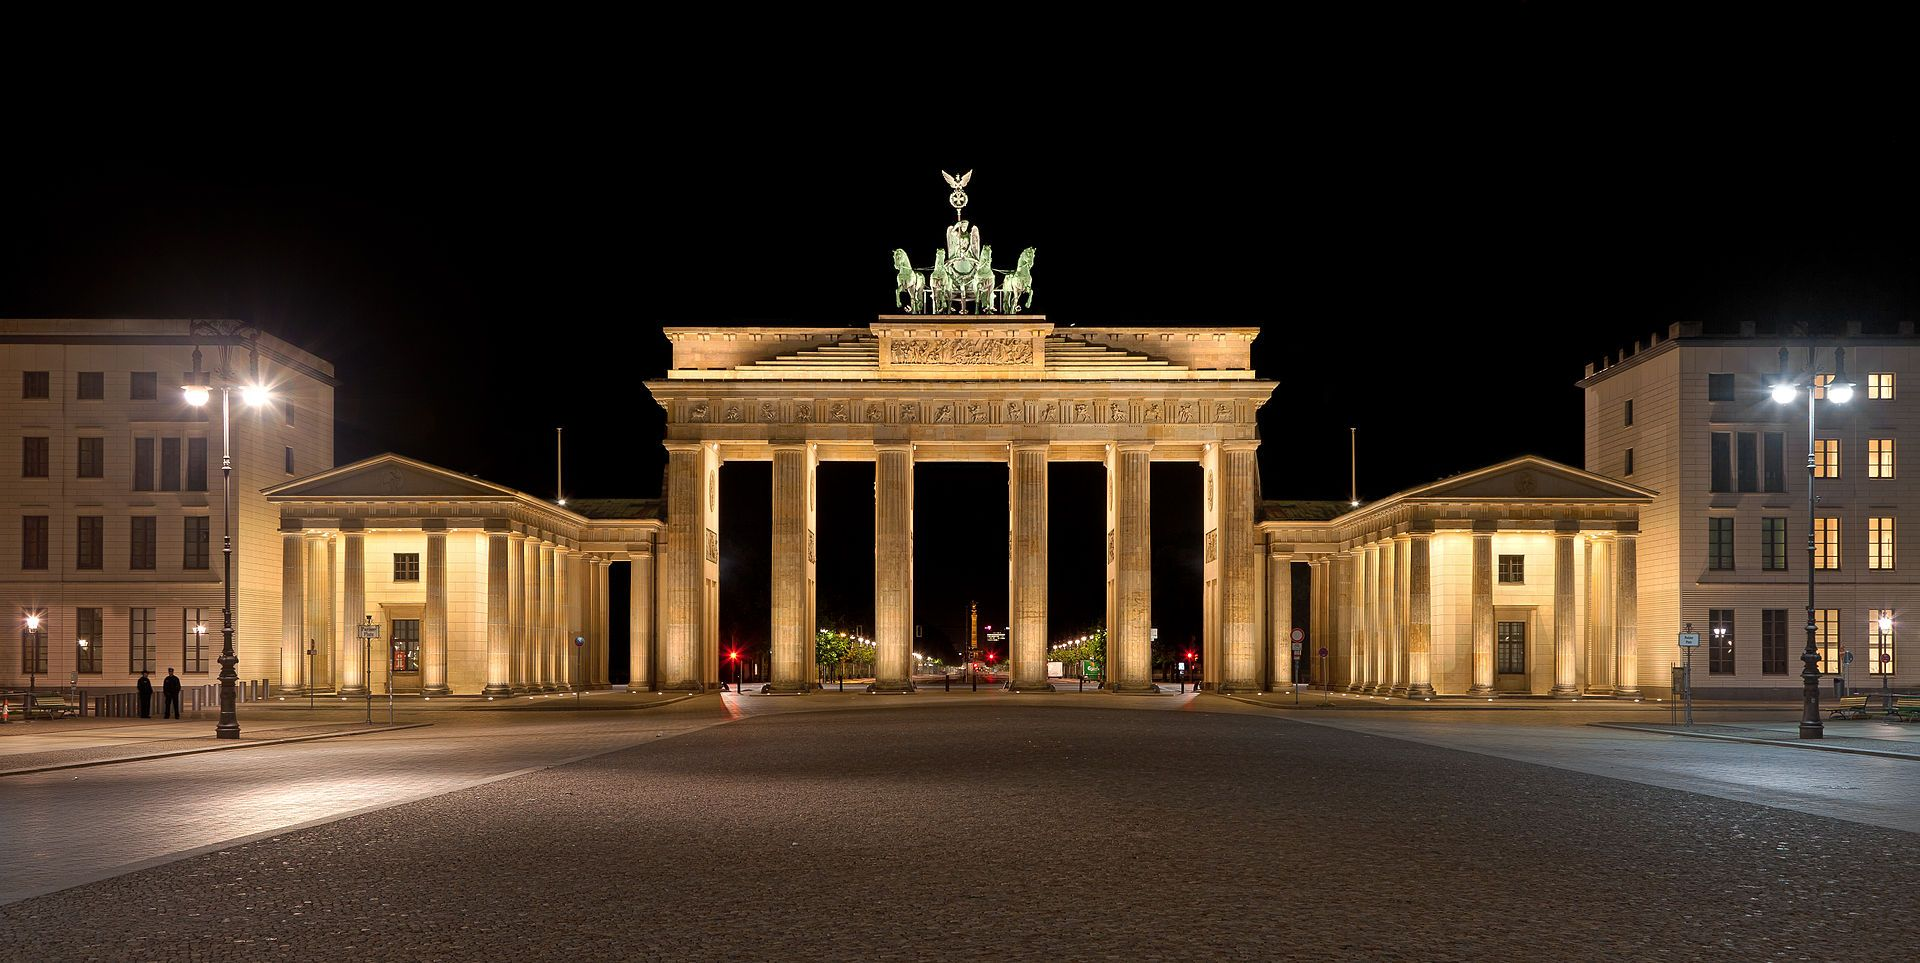 Brandenburger Tor Berlin Brandenburger Tor Brandenburger Tor Berlin Deutschland Burgen